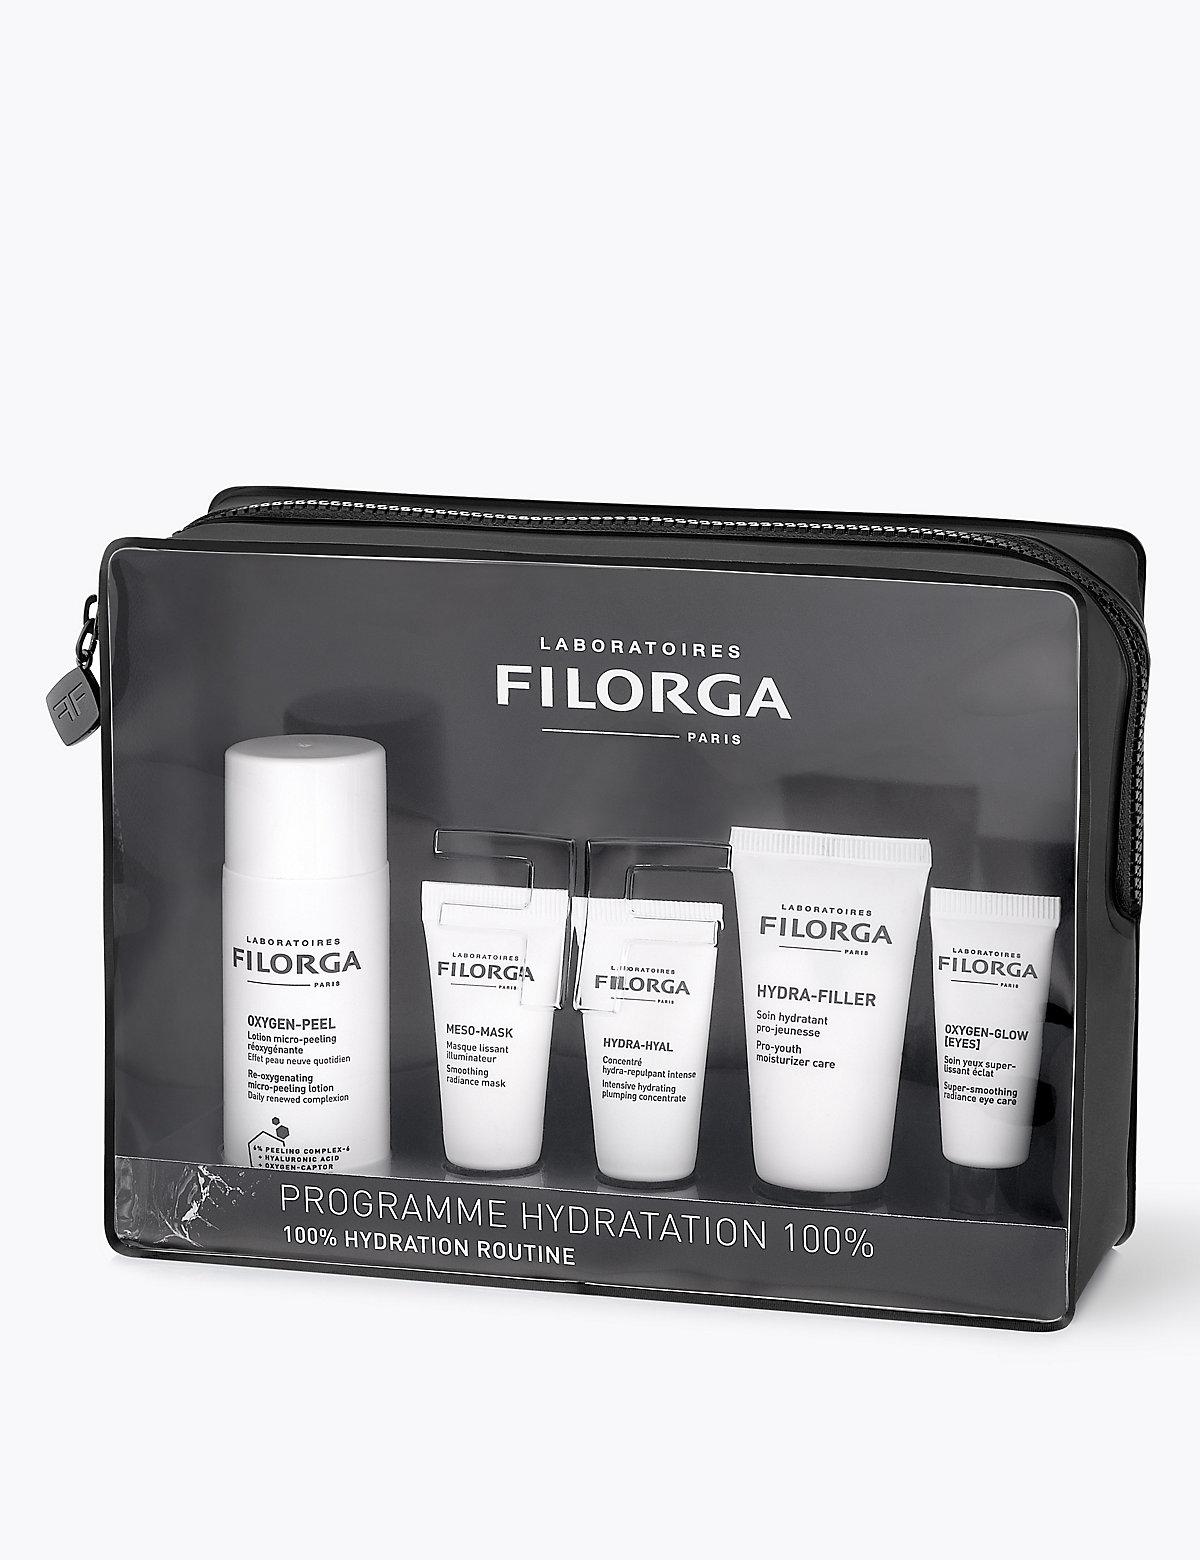 Filorga *Free Gift* Programme Hydratation Discovery Kit 83ml